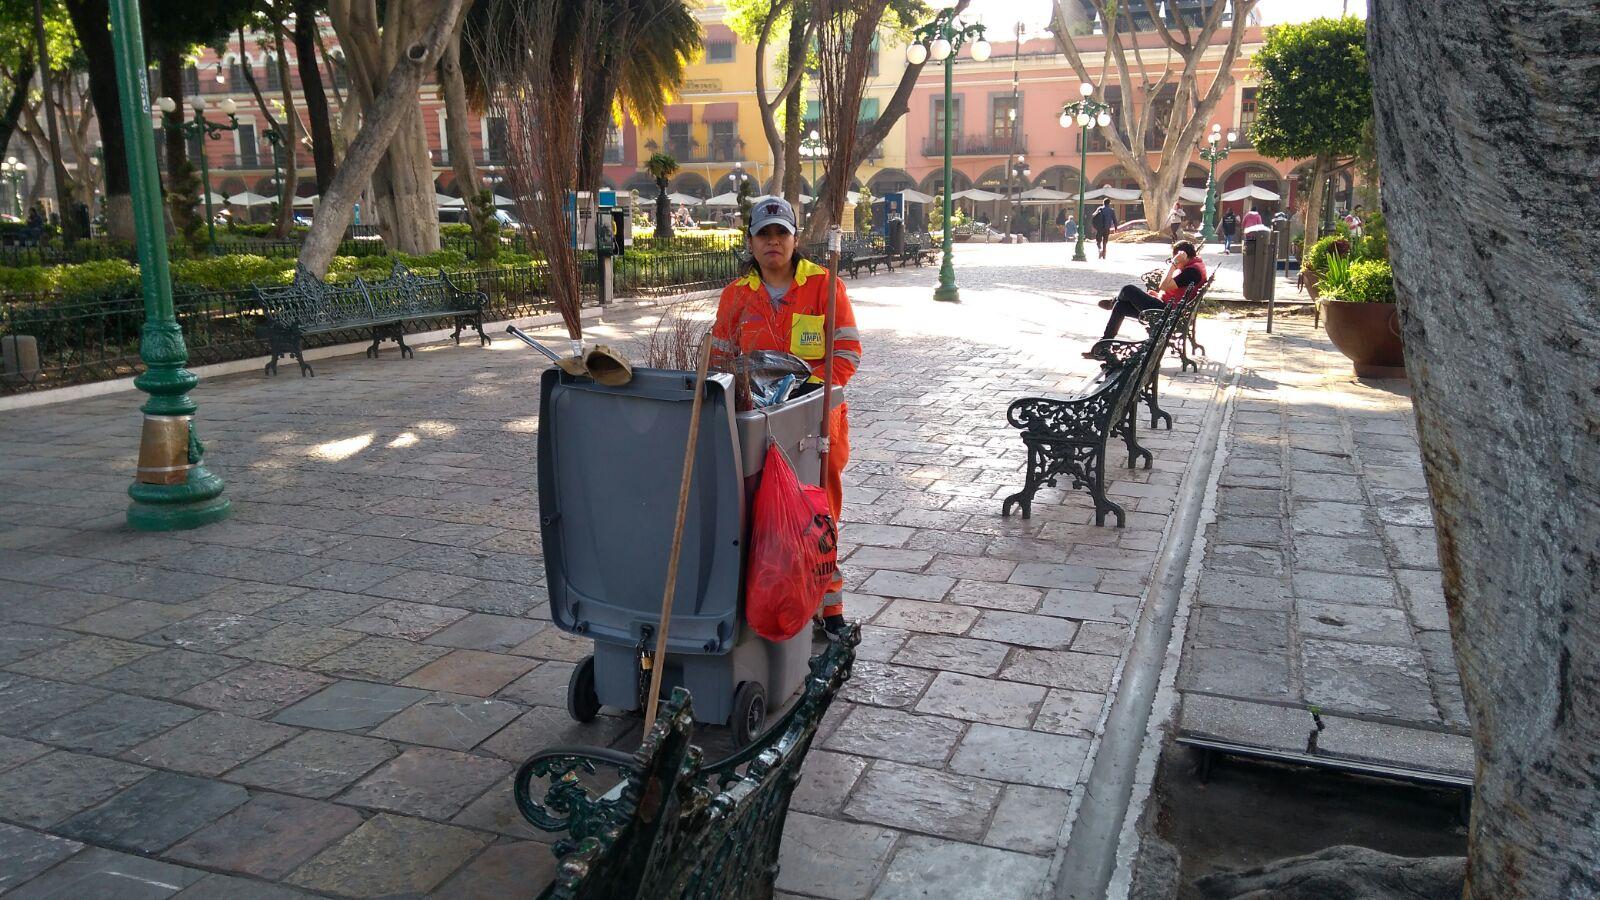 Tras otro descuento, naranjitas exigen salida de Pérez Xilotl